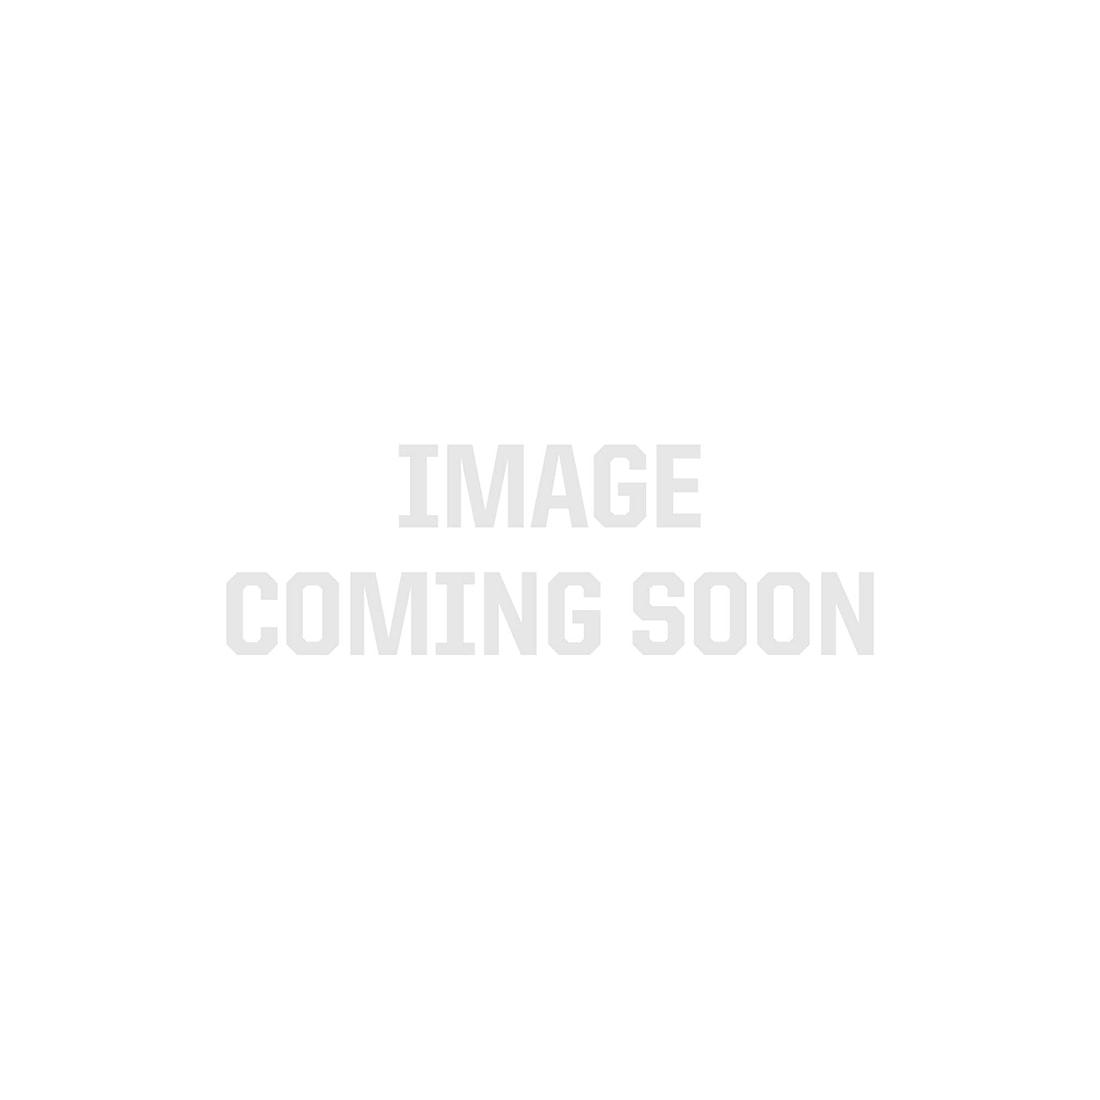 MaxLite 2x4 Eco-T LED Recessed Troffer, 45 Watts